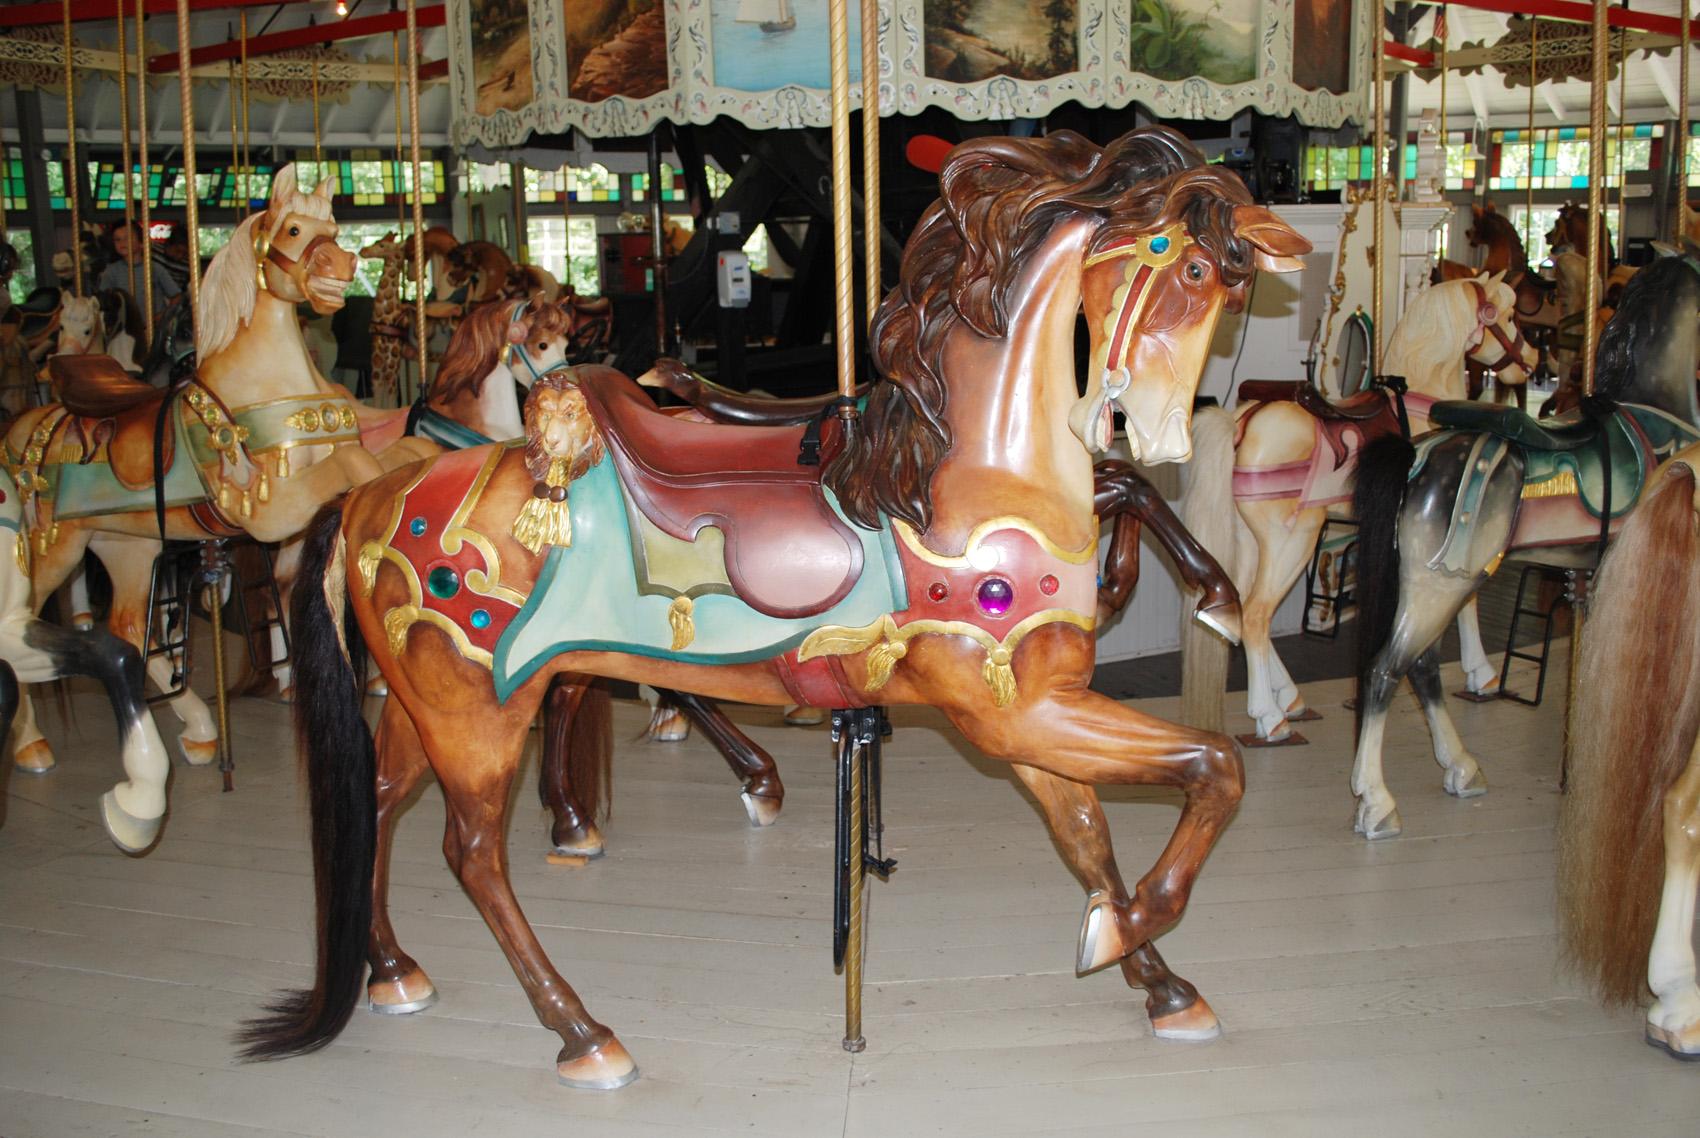 1895-Looff-carousel-horse-stander-Slater-Park-RI-77